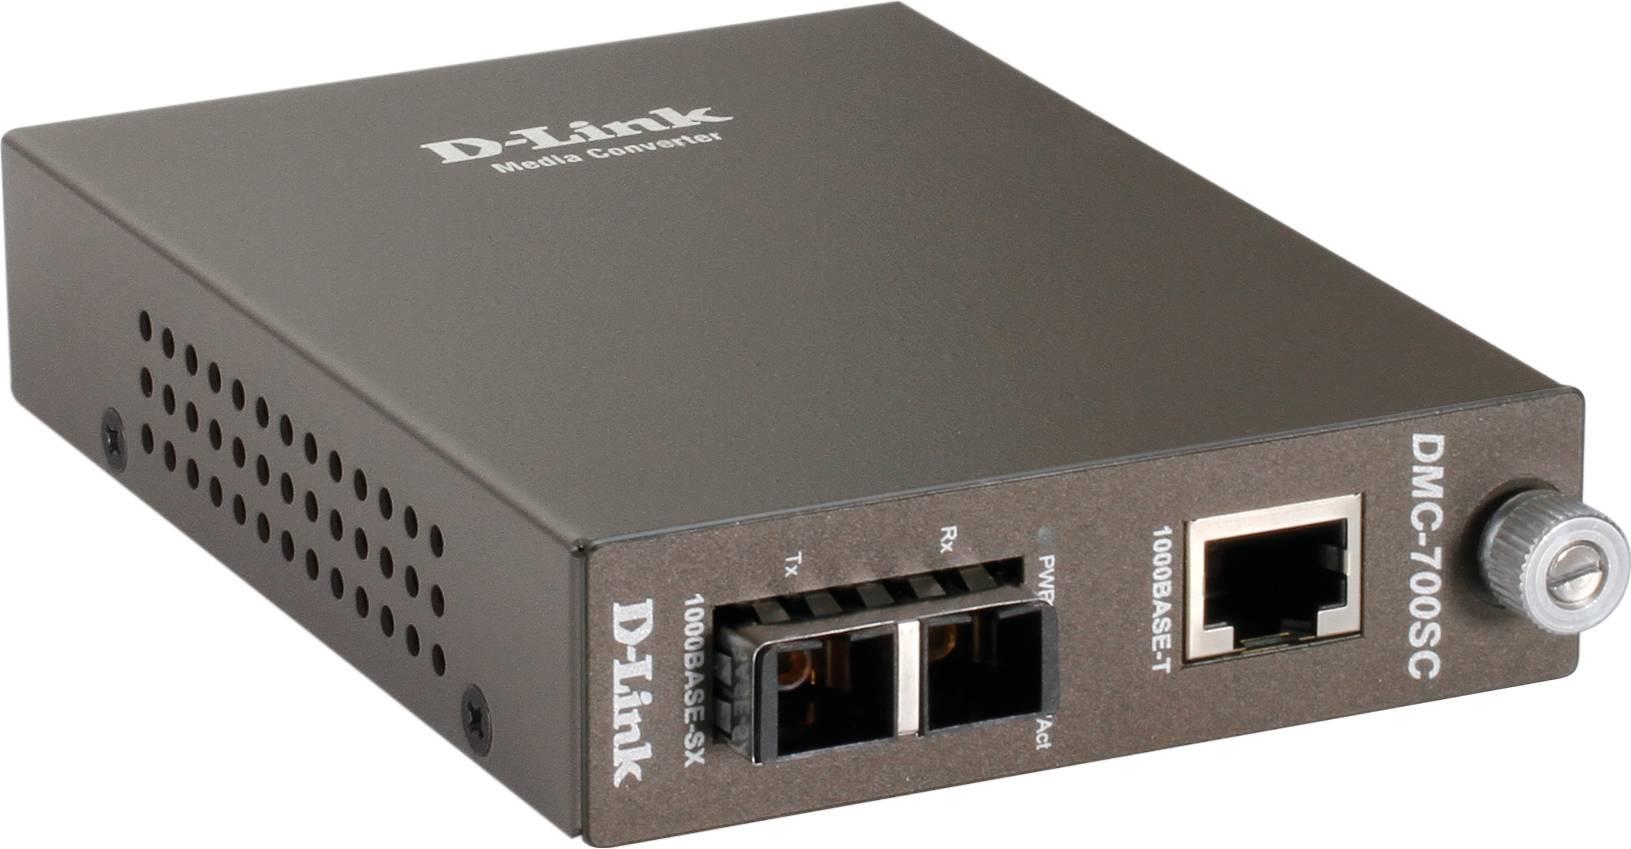 D-Link Medieomvandlare 1000Base-SX, 1000Base-T thumbnail